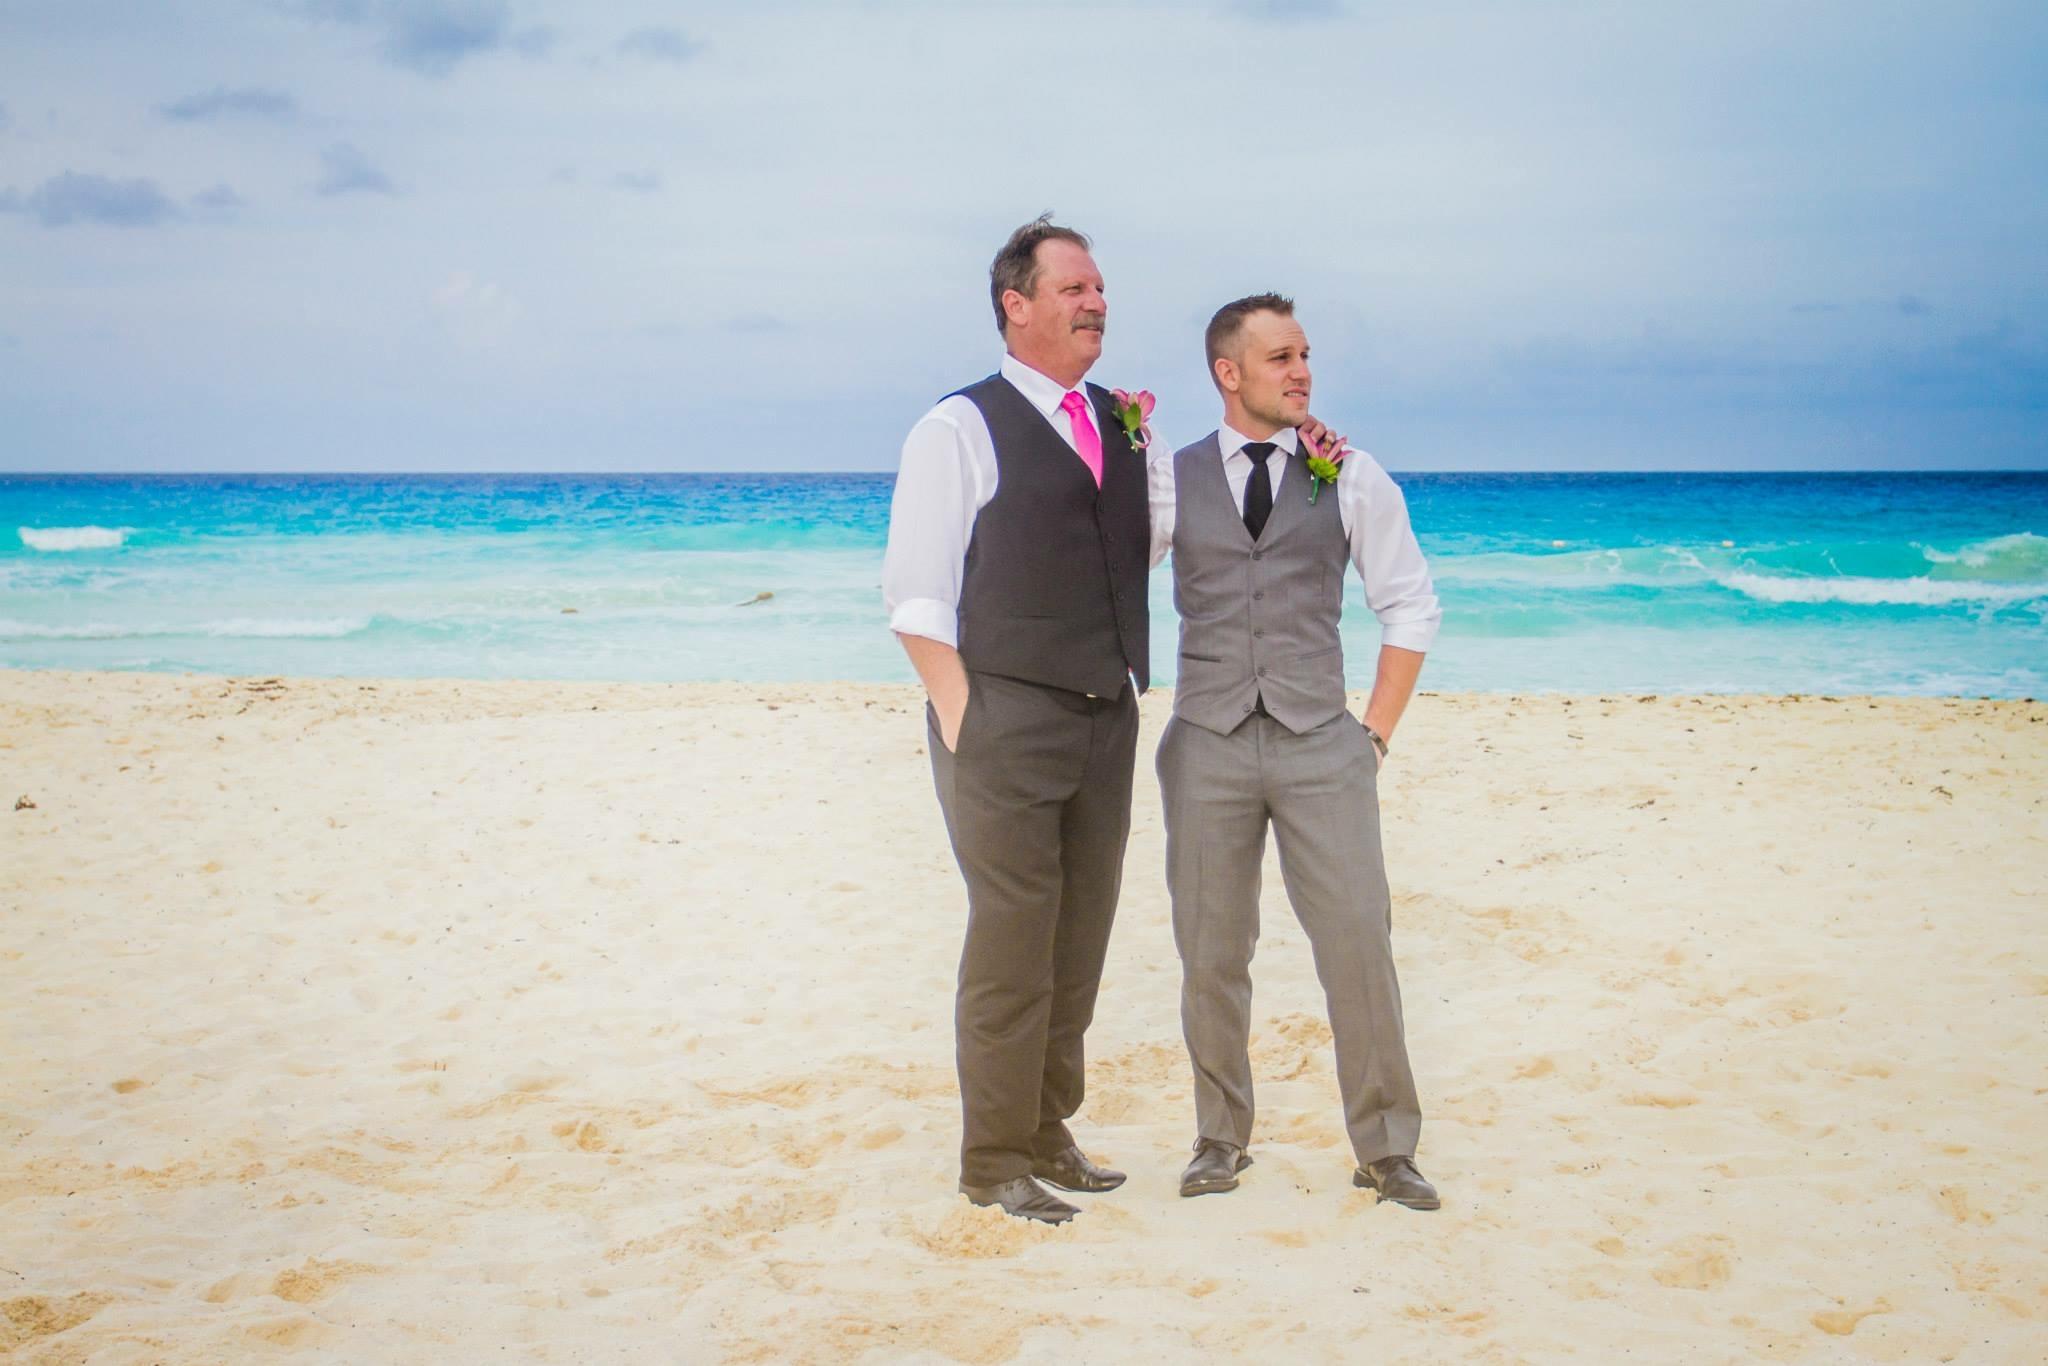 krysten-reed-cancun-beach-wedding-6.JPG